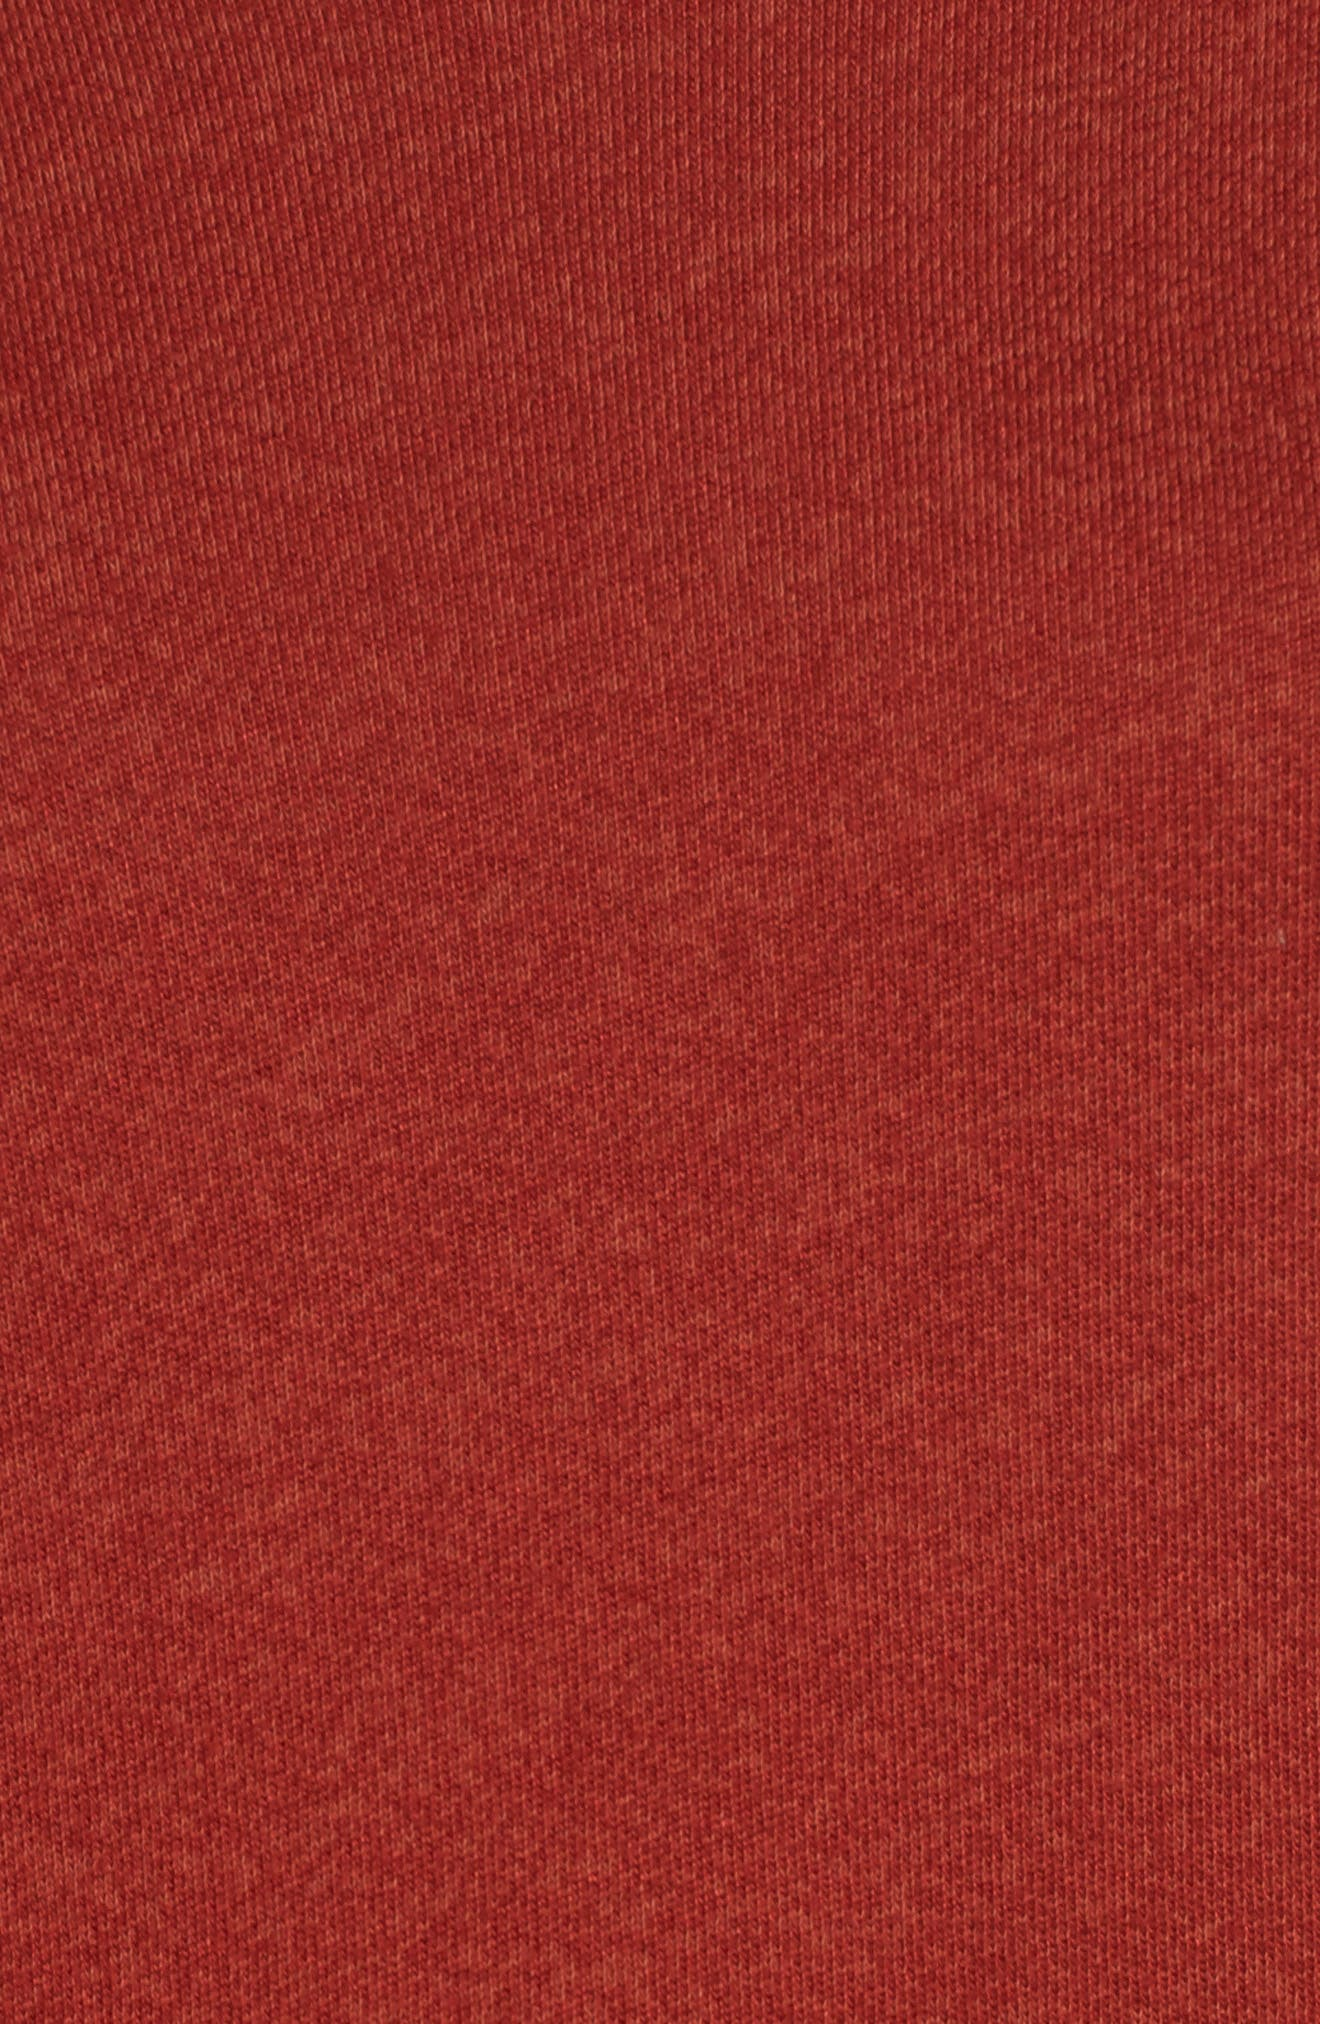 Penny Hooded Sweatshirt,                             Alternate thumbnail 5, color,                             Rust